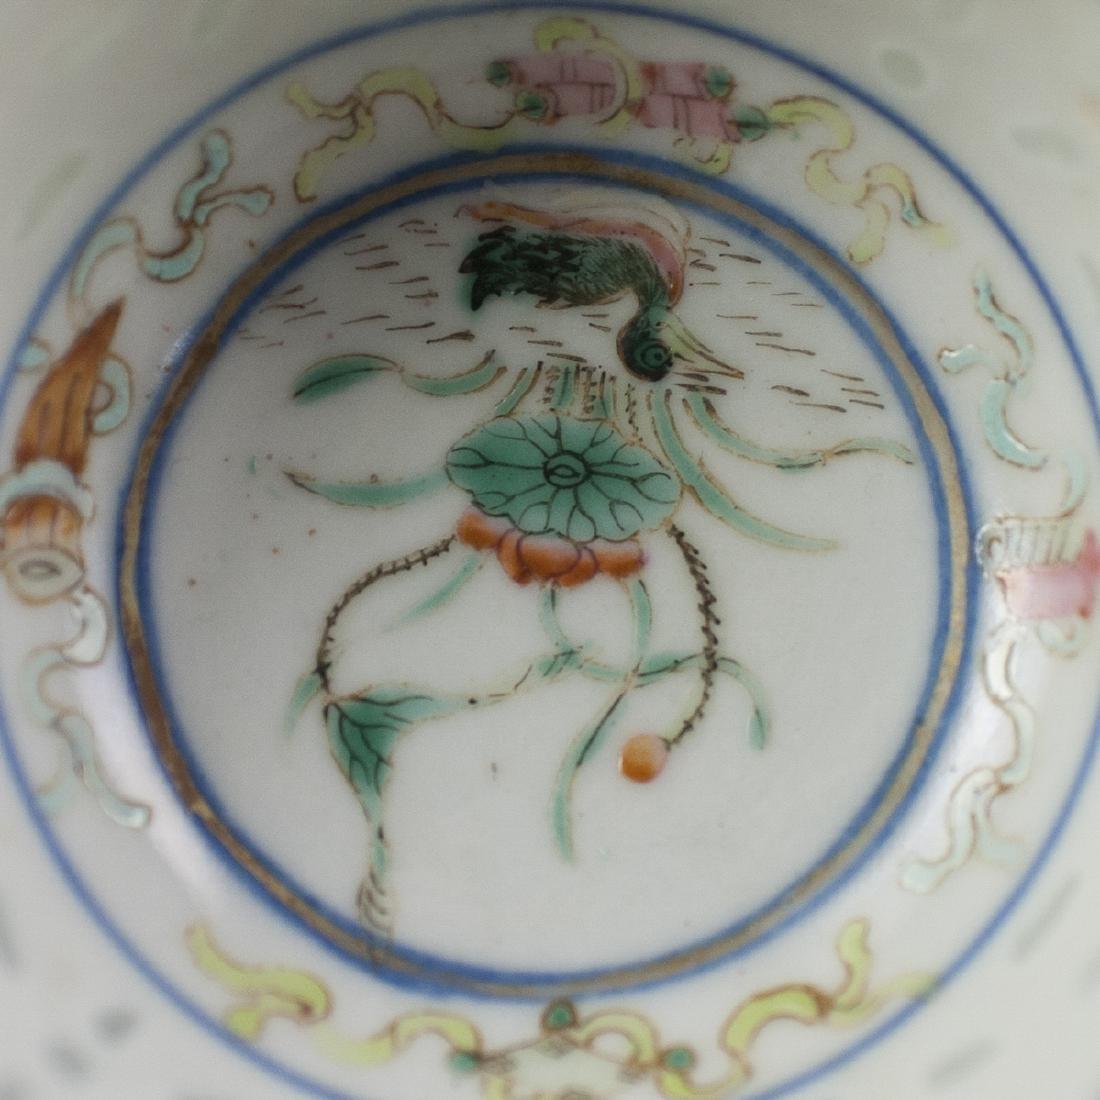 Chinese Porcelain De Riz Ware Demitasse Set - 7